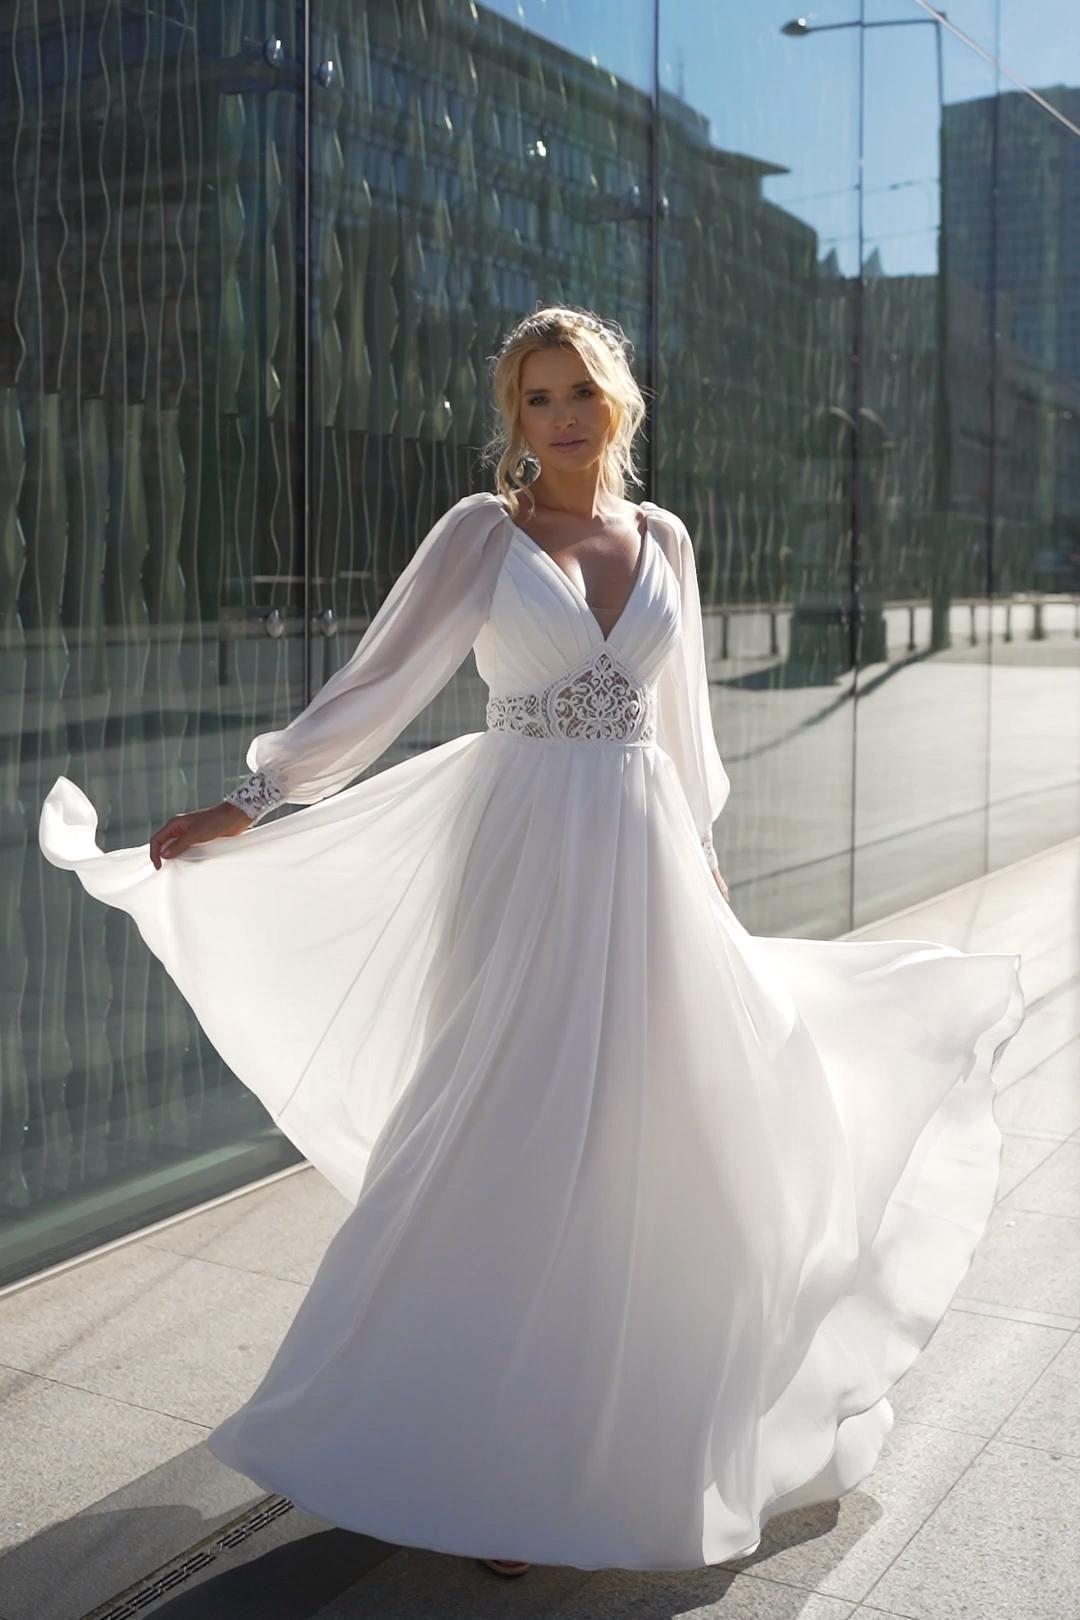 Gladka Suknia Slubna Vintage Z Bufiastymi Rekawami Safona I Nowa Kolekcja Pracowni Dama Couture Video Fashion Dress Party Wedding Dresses Wedding Dress Long Sleeve